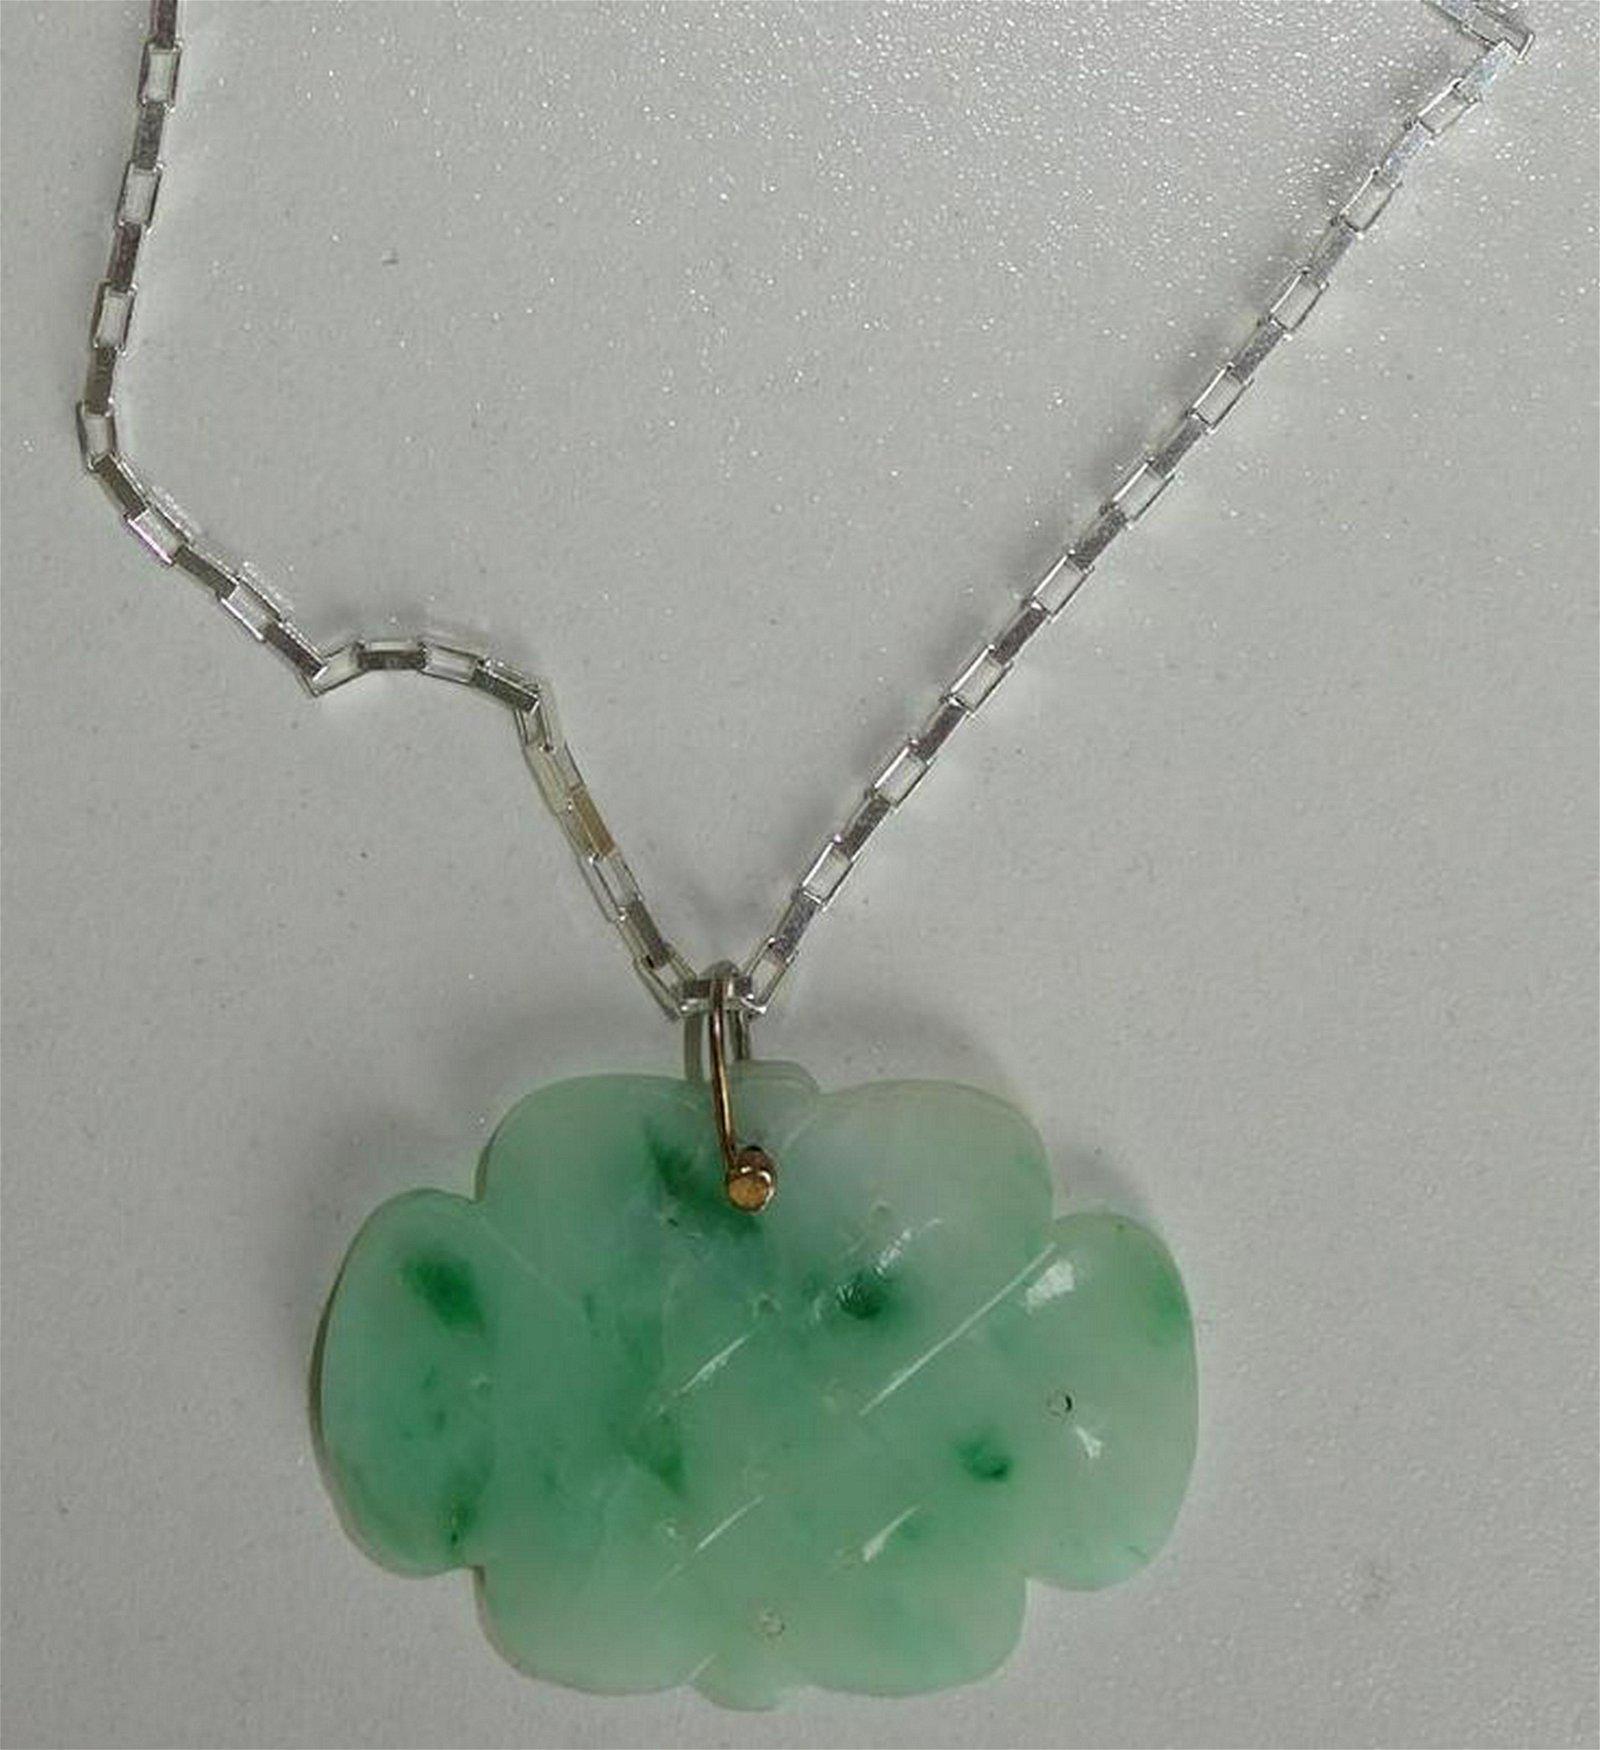 Carved Jade Pendant & Sterling Silver Necklace